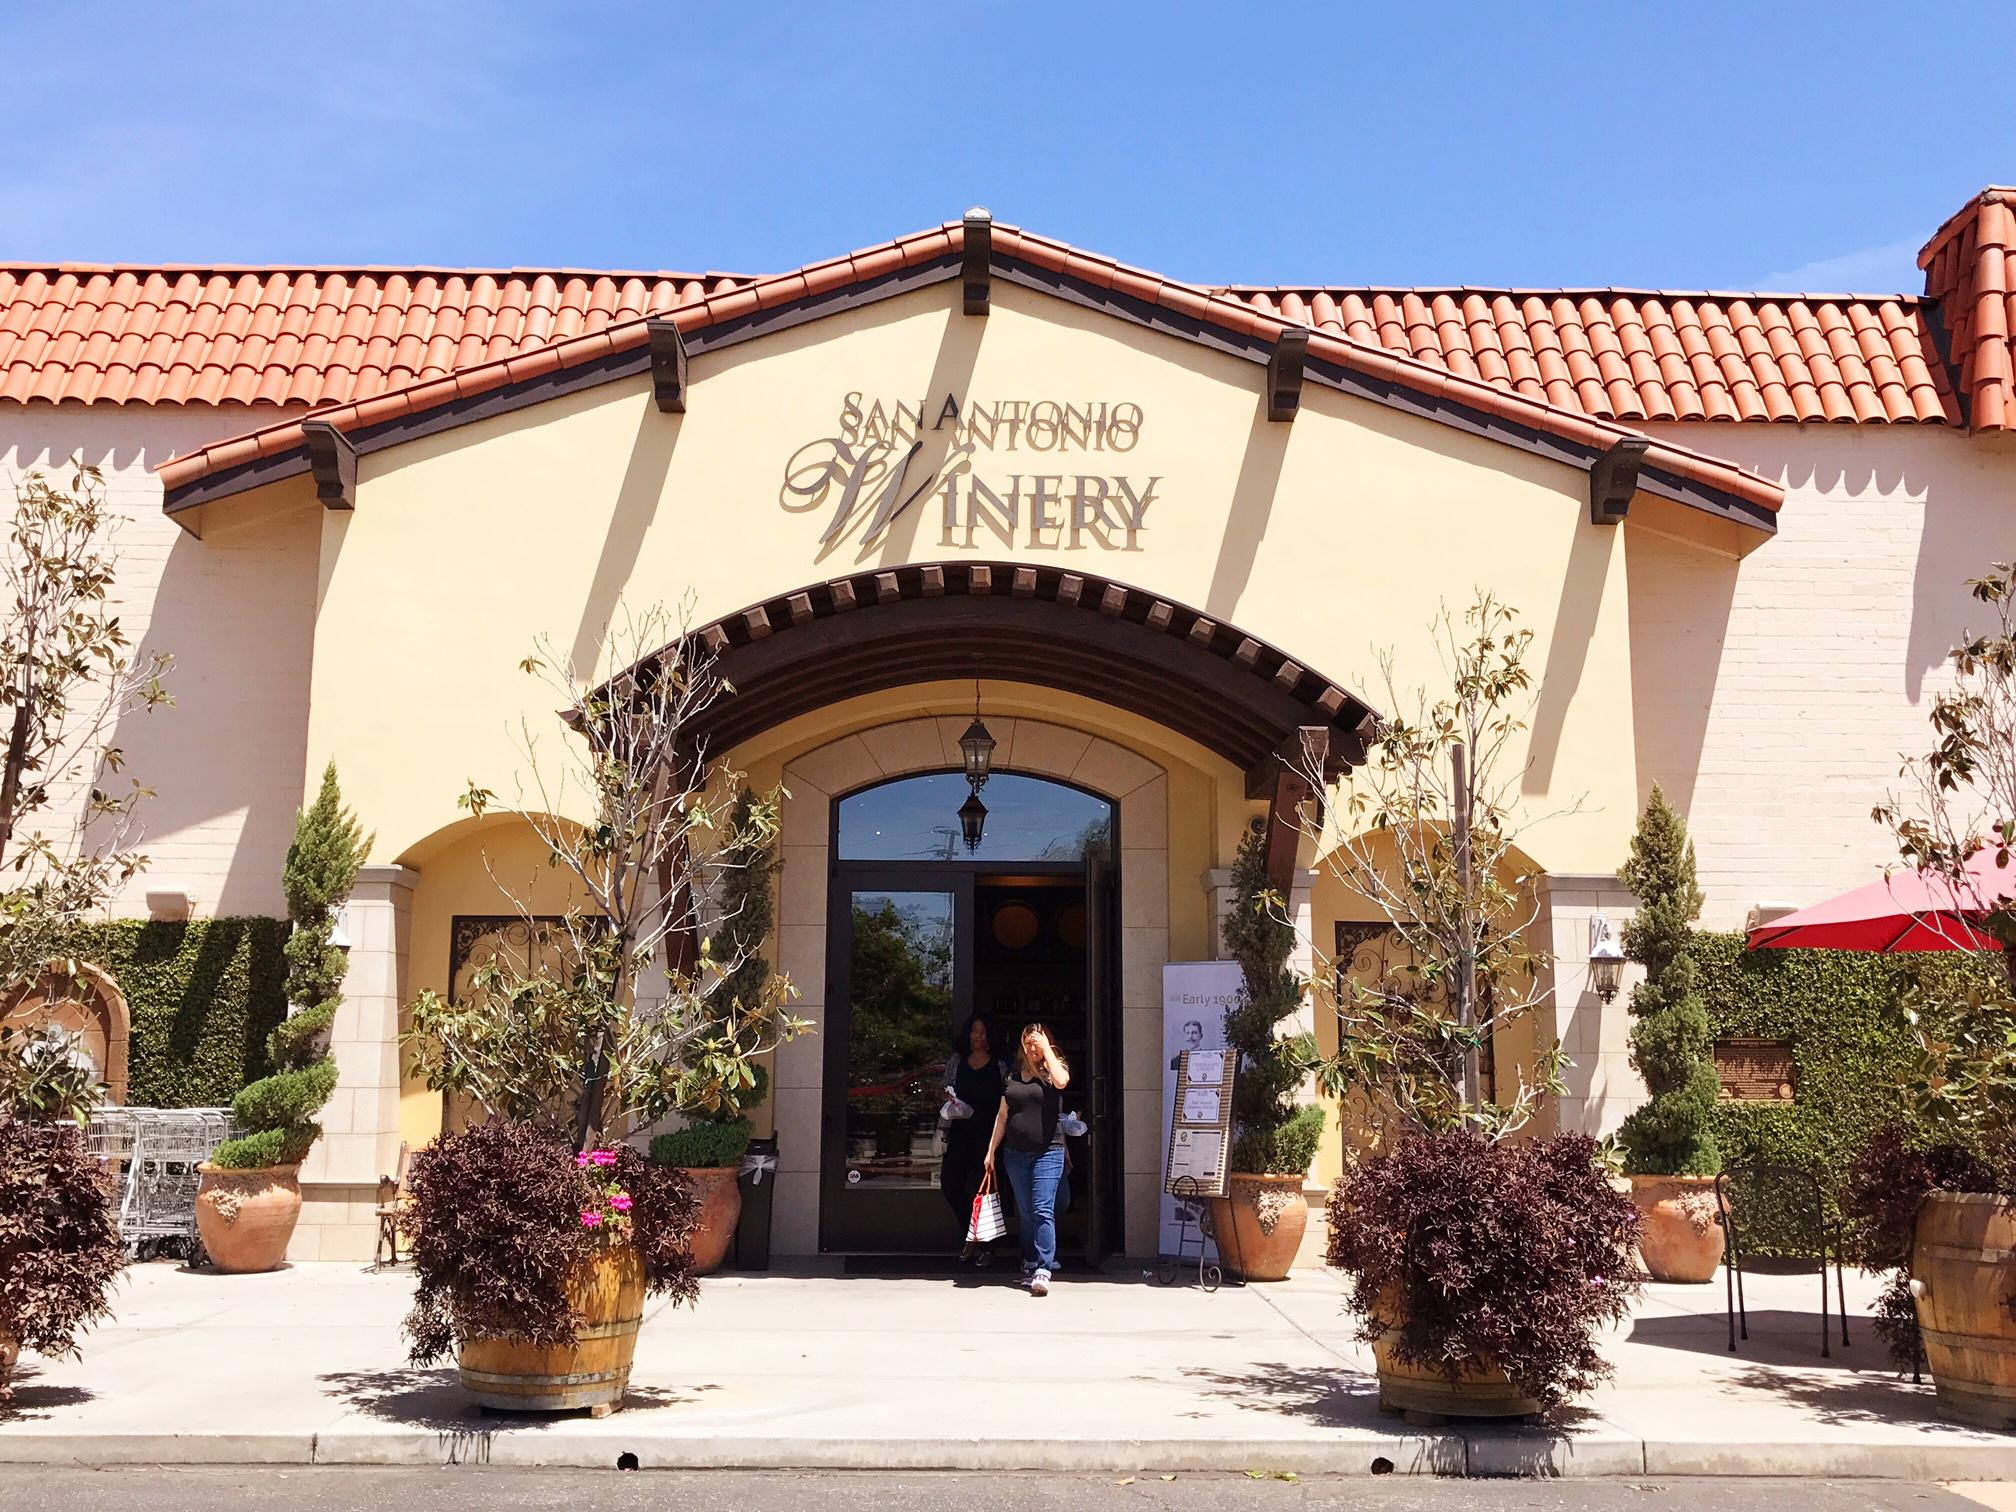 Visiting San Antonio Winery in Downtown Los Angeles